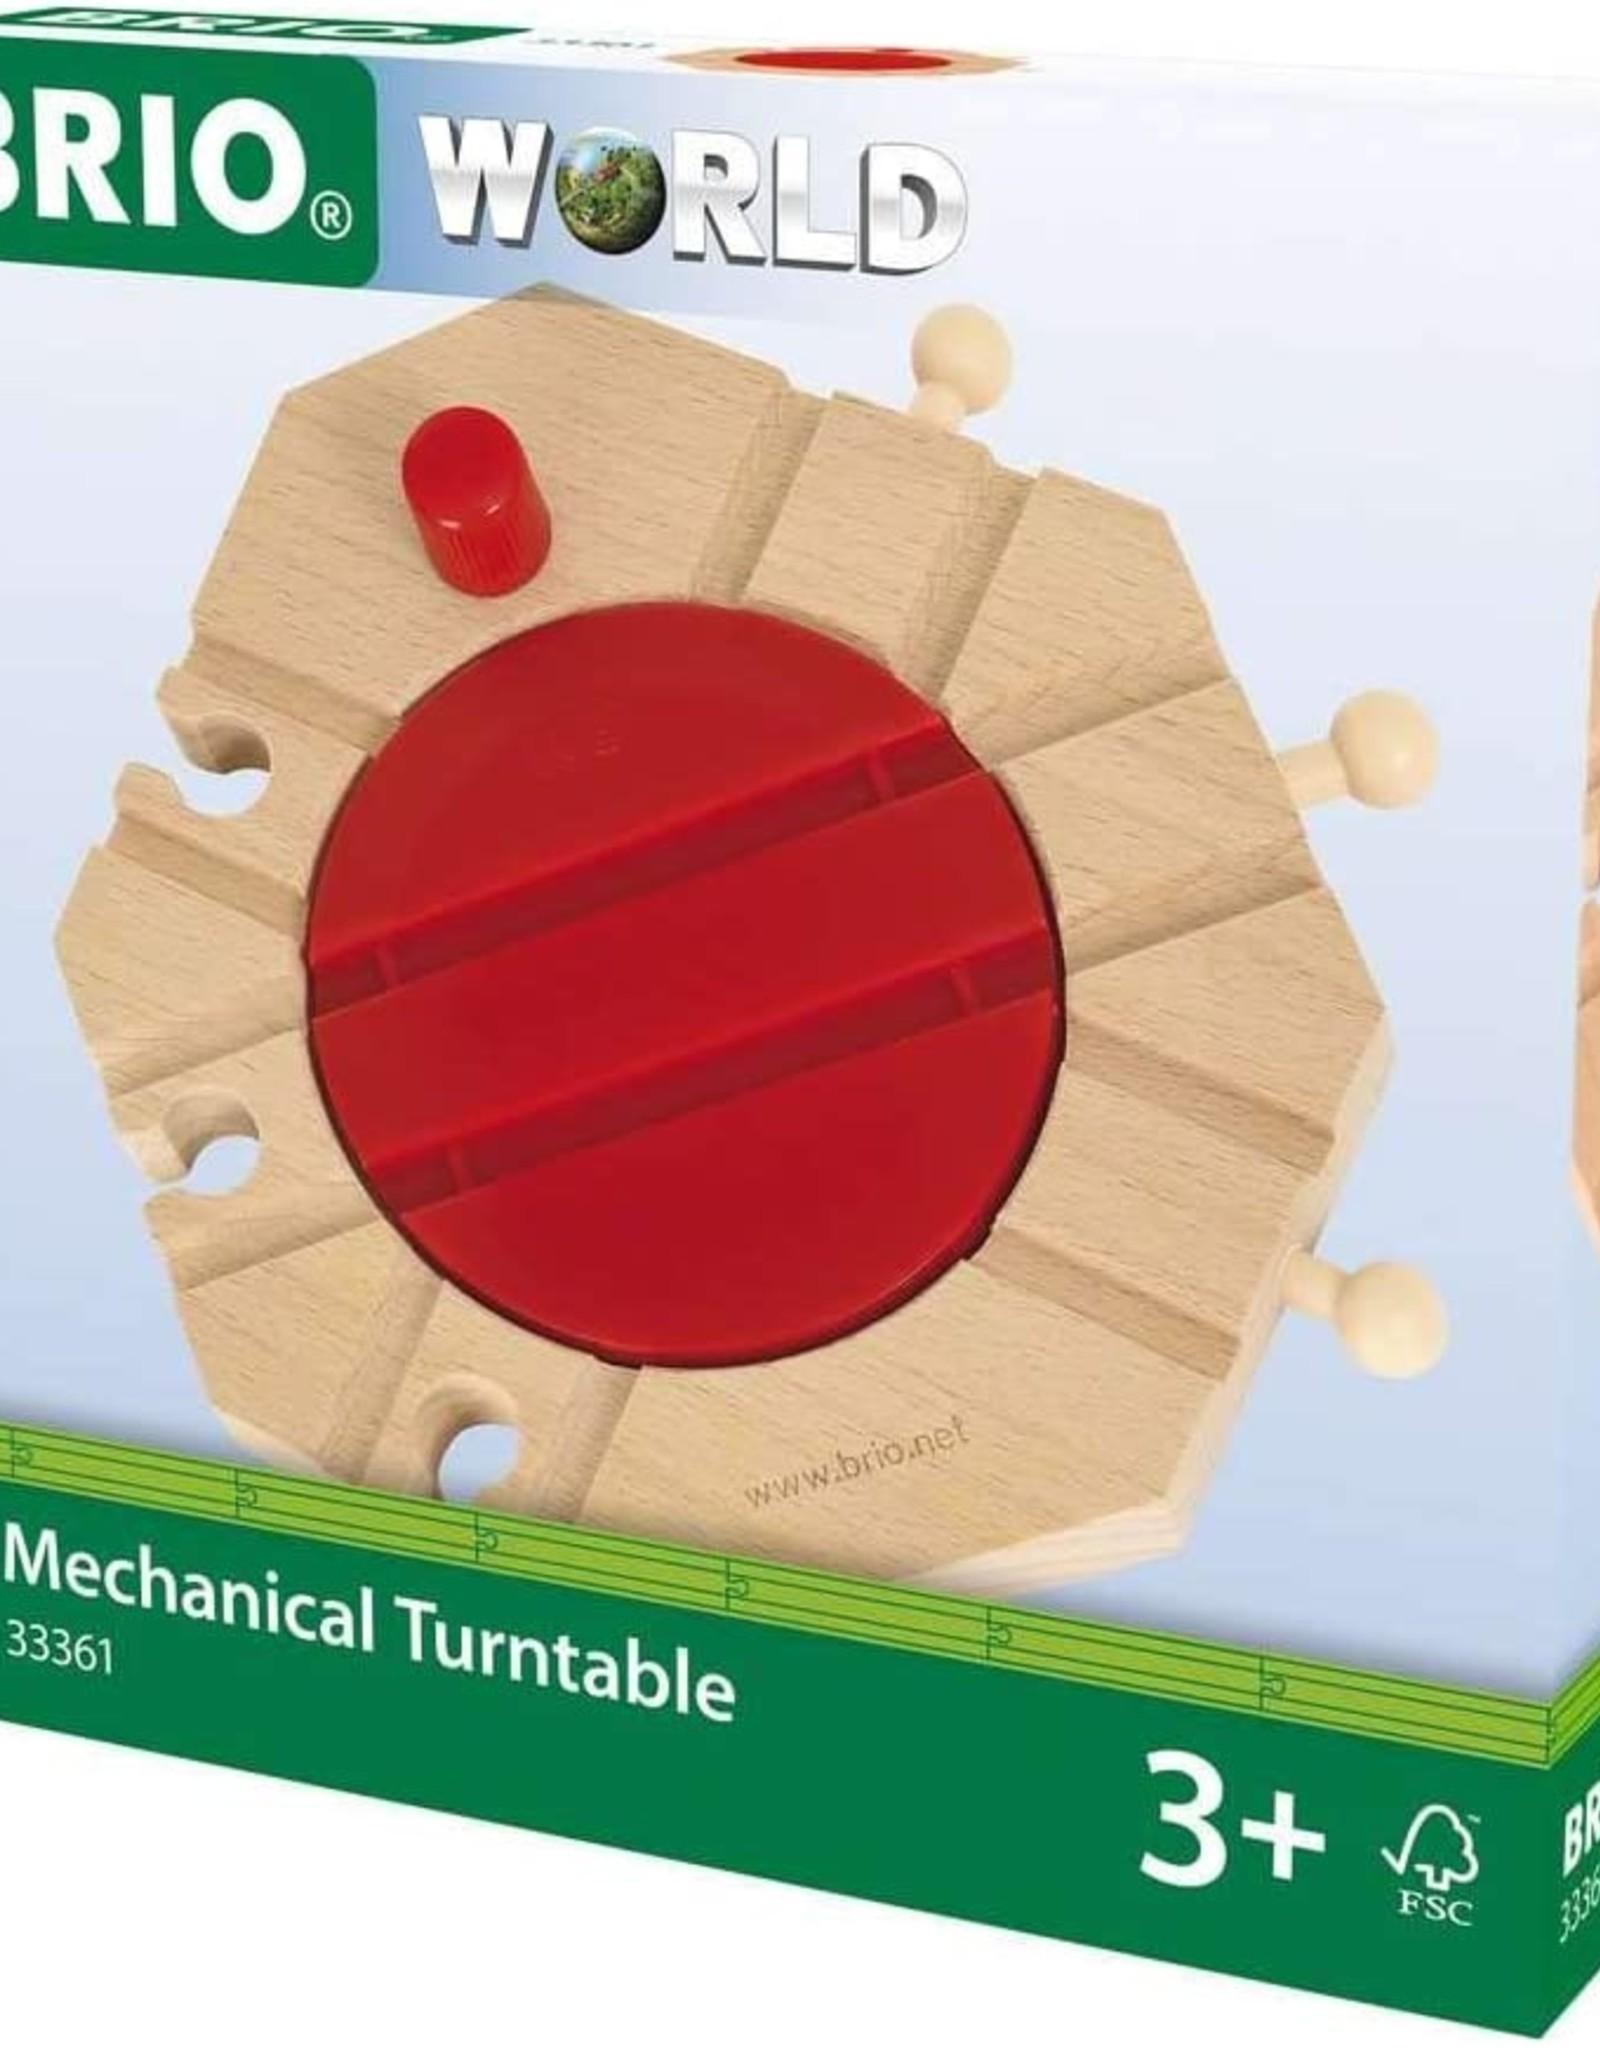 Brio BRIO Mechanical Turntable